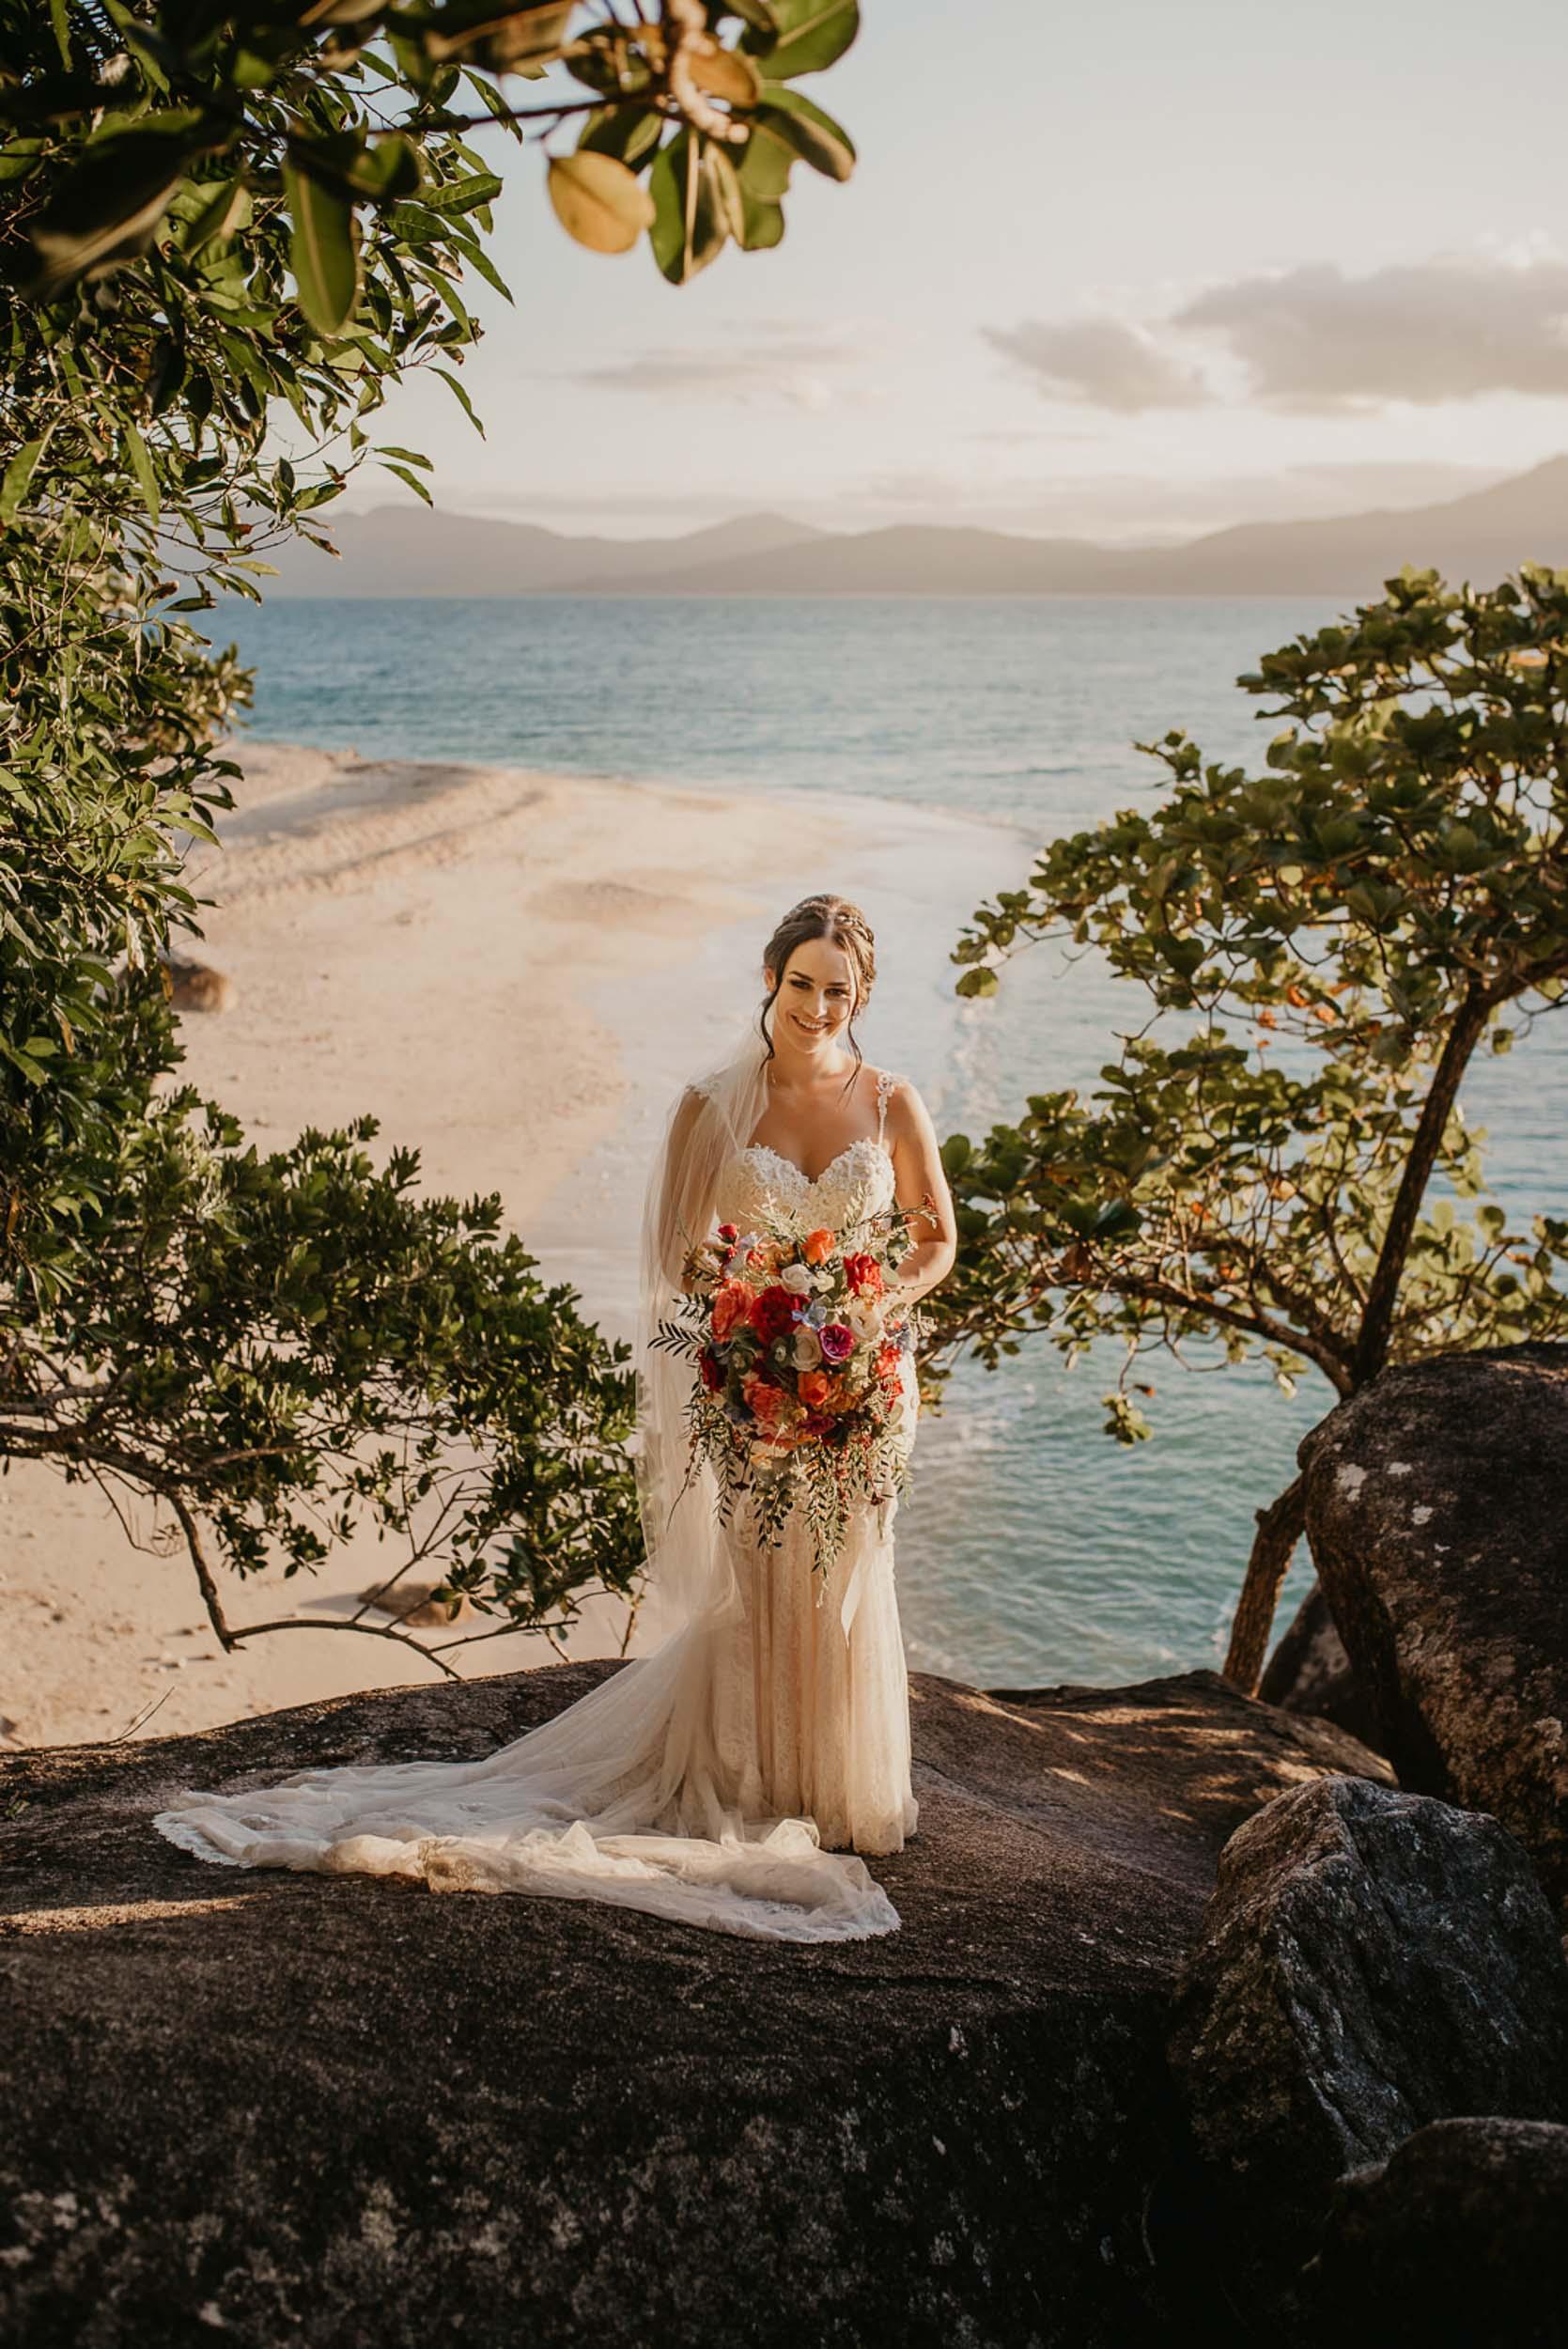 The Raw Photographer - Cairns Wedding Photographer - Fitzroy Island - Destination Wedding - Bride Dress - Groom Portrait - Queensland-34.jpg